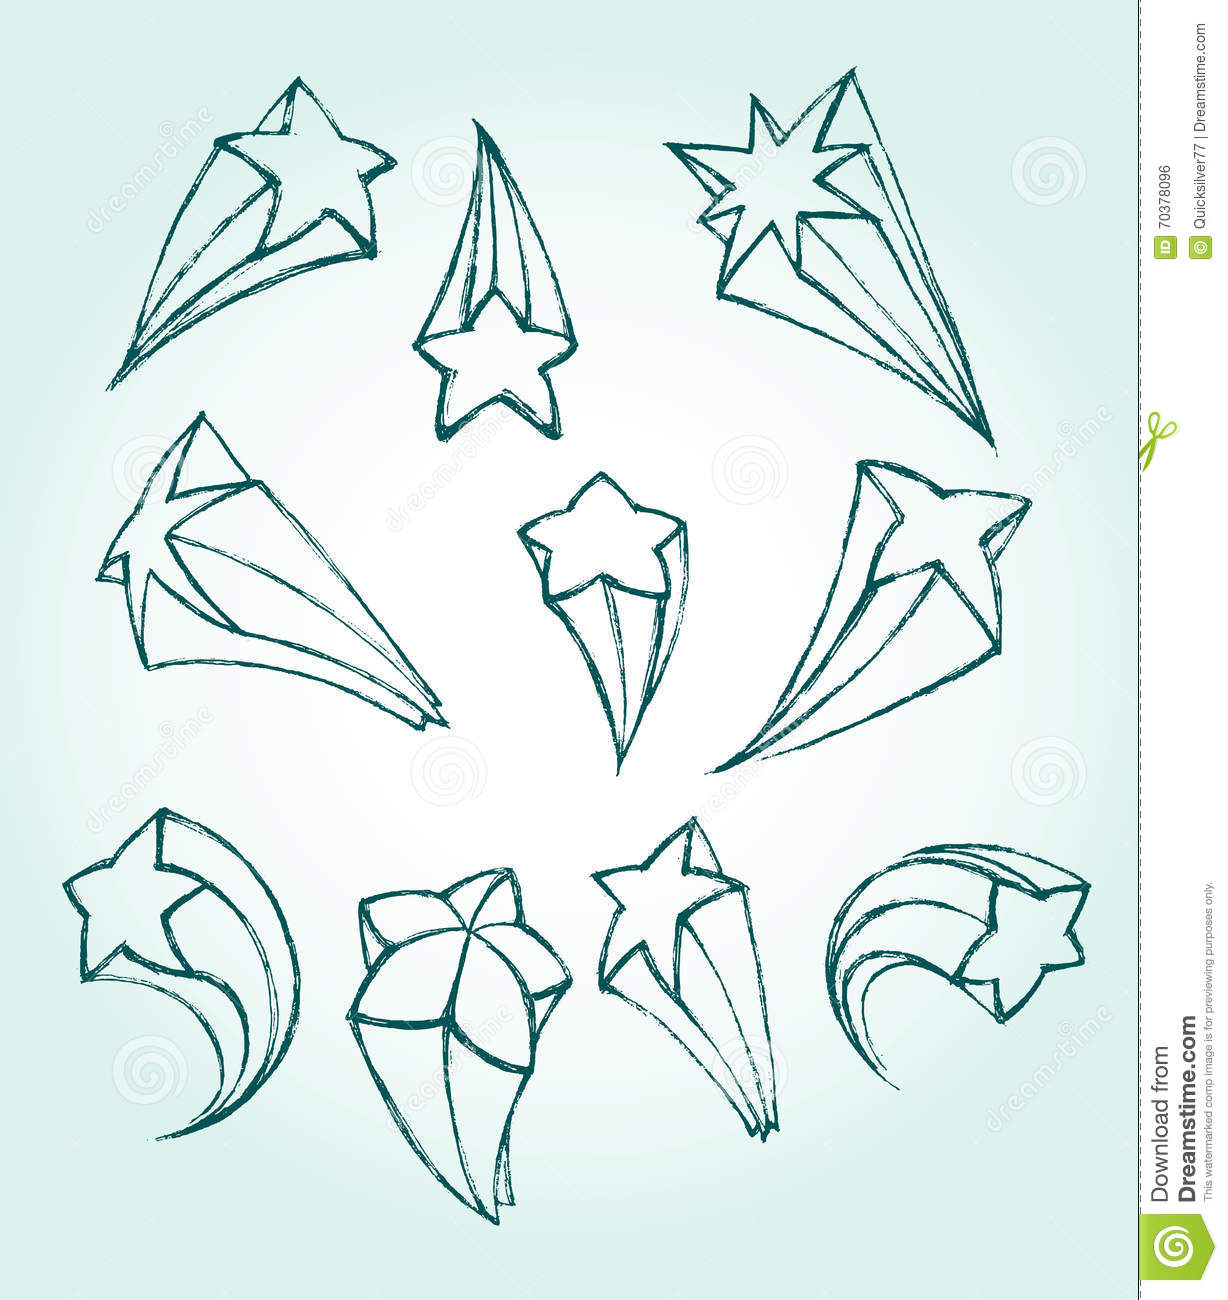 1228x1300 Drawn Falling Stars Sketchy 3320176